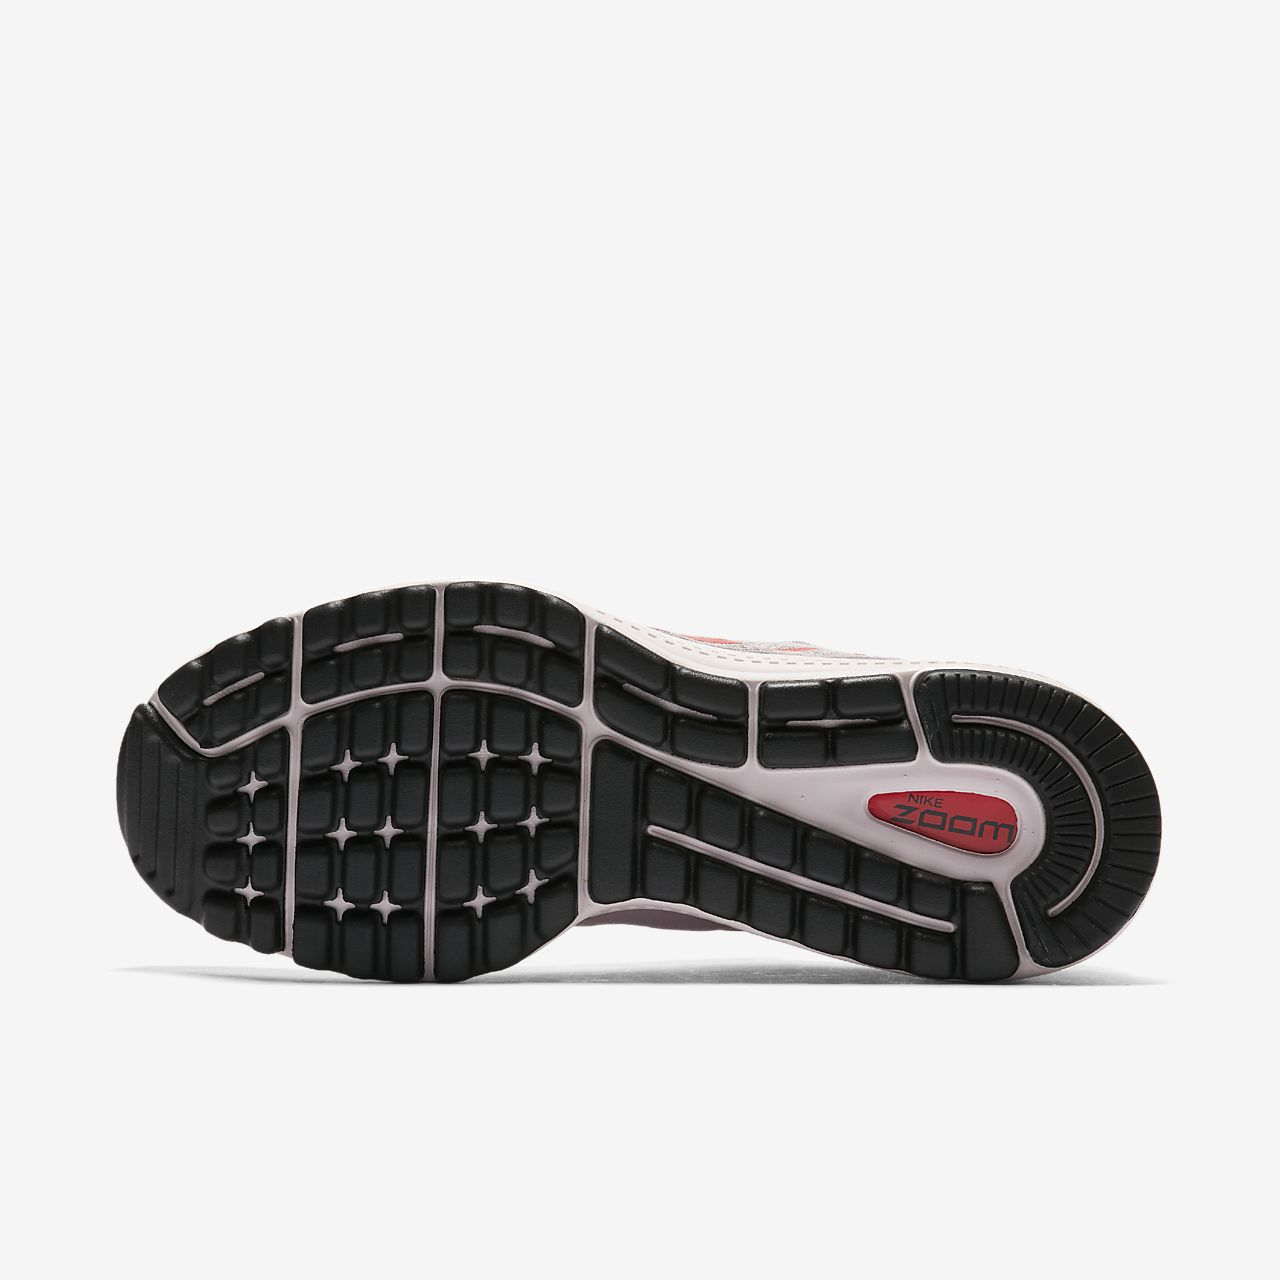 best service d58fd 53fe5 ... Nike Air Zoom Vomero 13 Women s Running Shoe